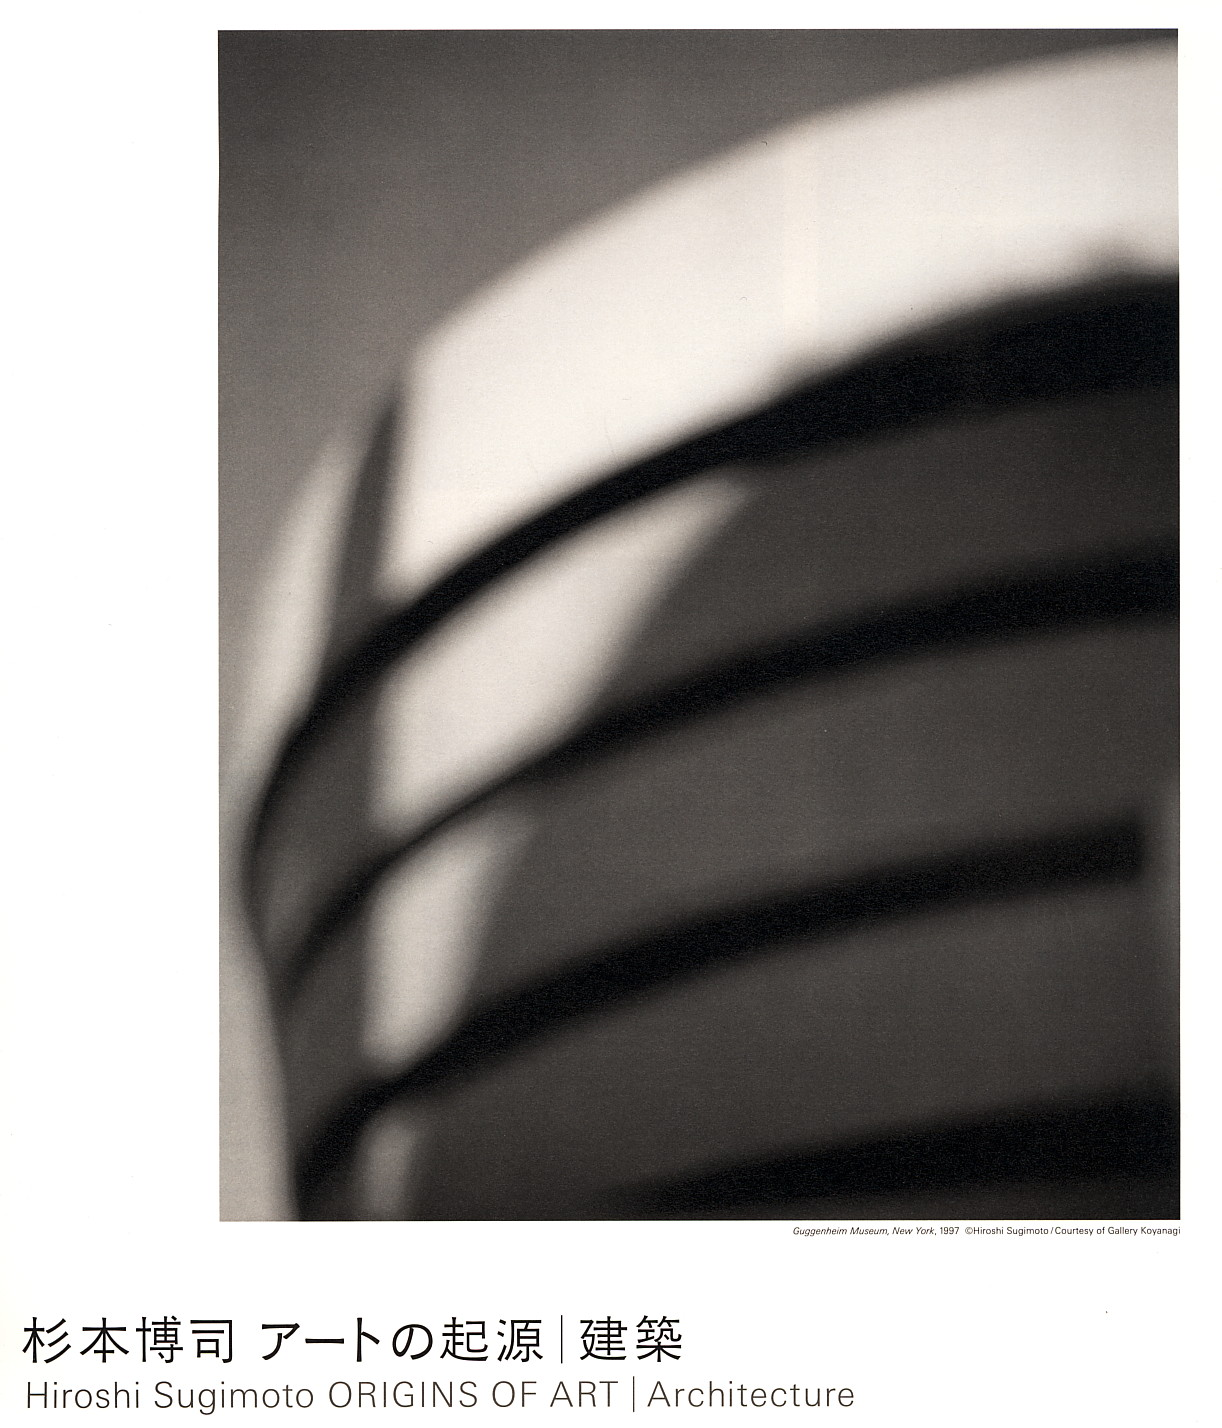 杉本博司アートの起源・建築_f0099102_16918.jpg